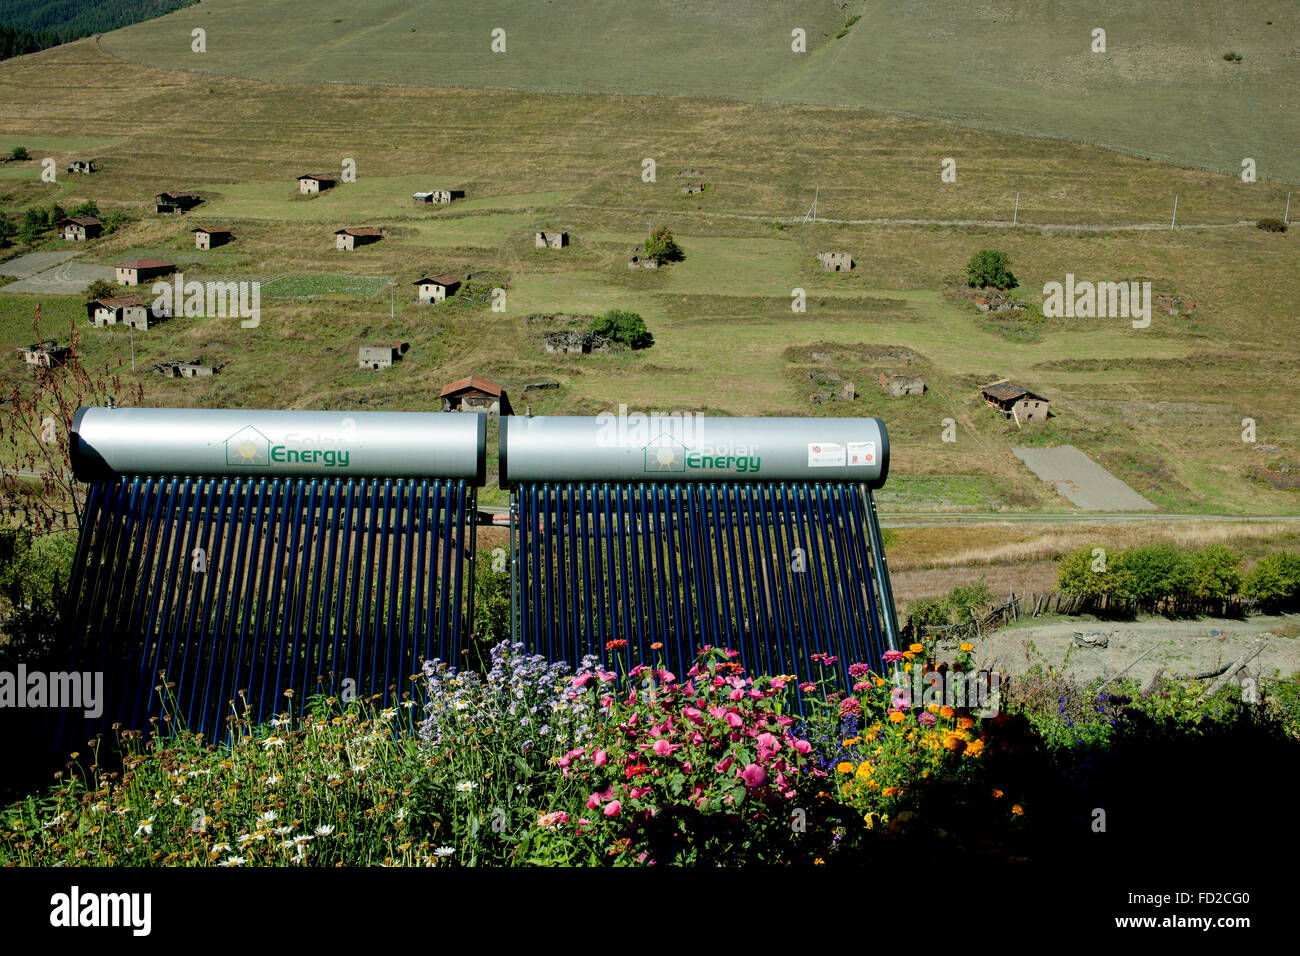 Georgien, Kachetien, Tuscheti-Nationalpark, Shenako, typisches Dorfhaus Solarzellen - Stock Image